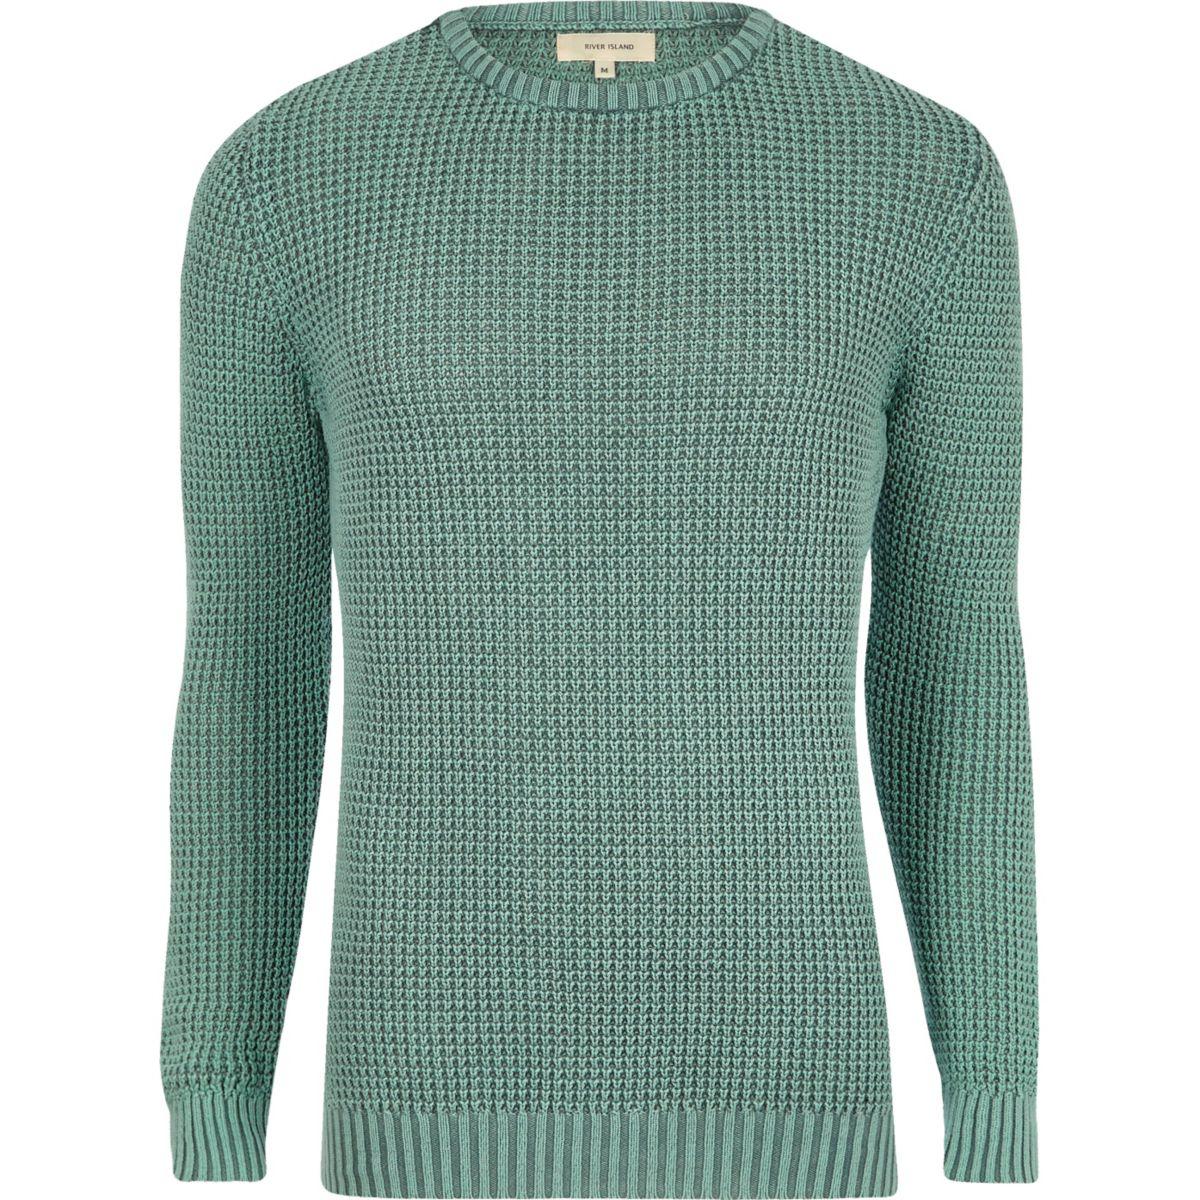 Light green acid wash slim fit knit jumper